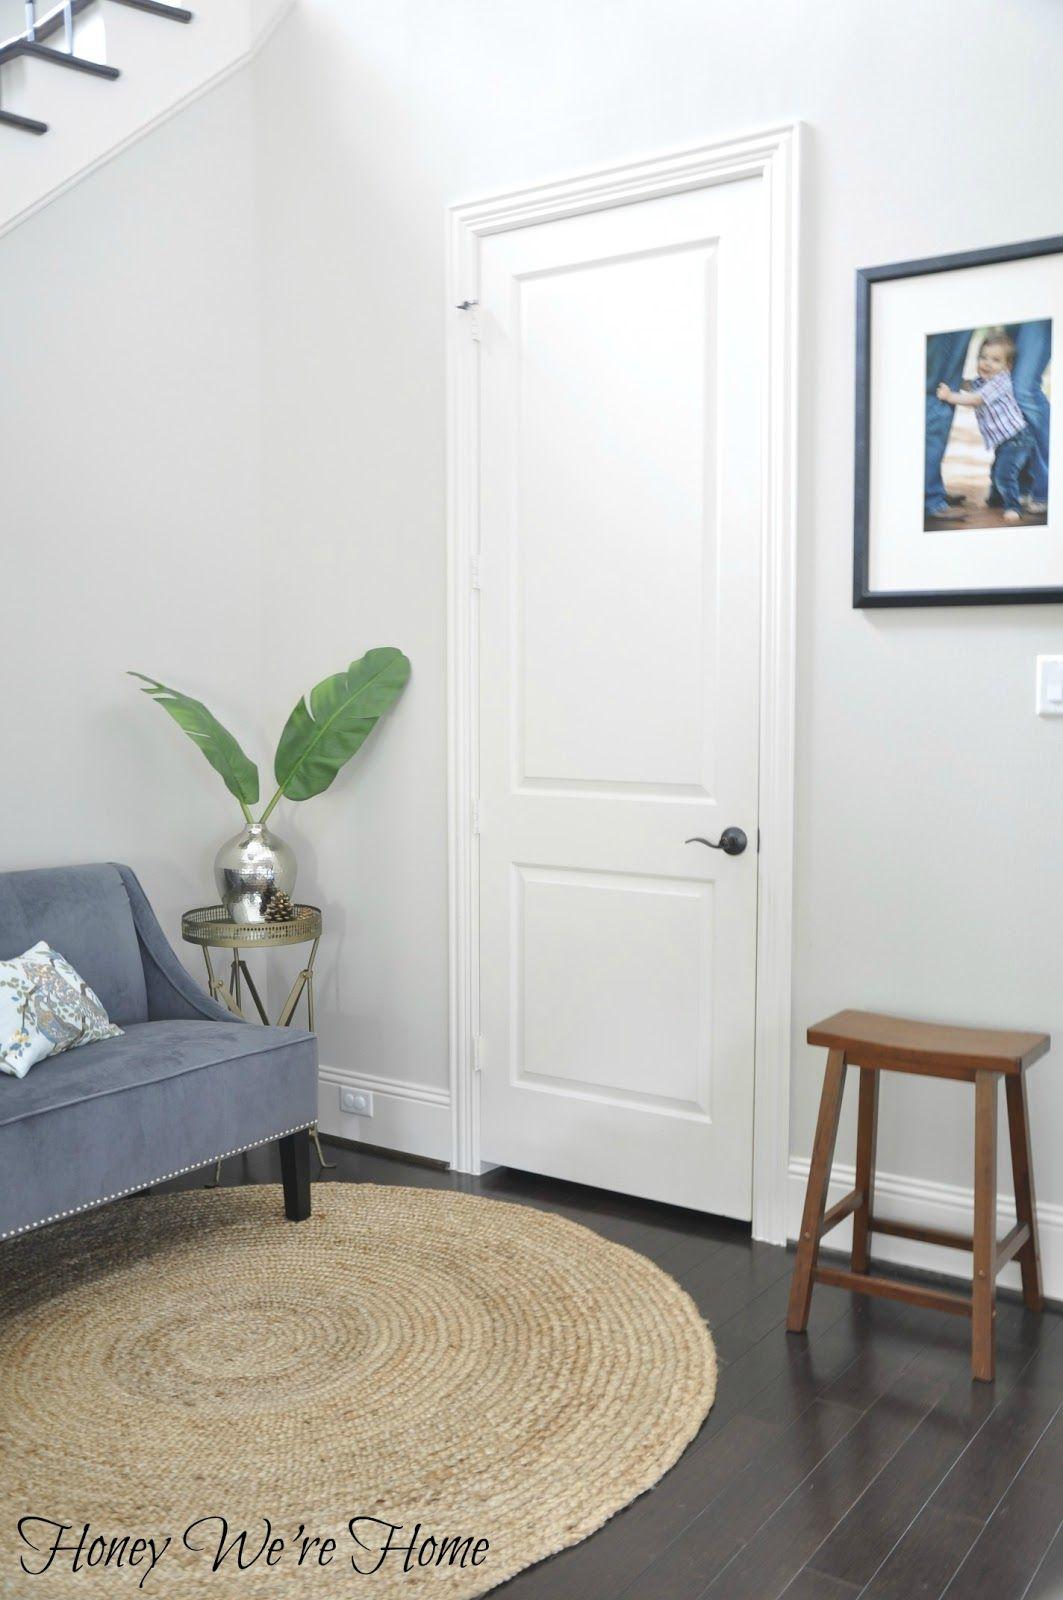 Honey Weu0027re Home: Black/Gray Painted Interior Doors